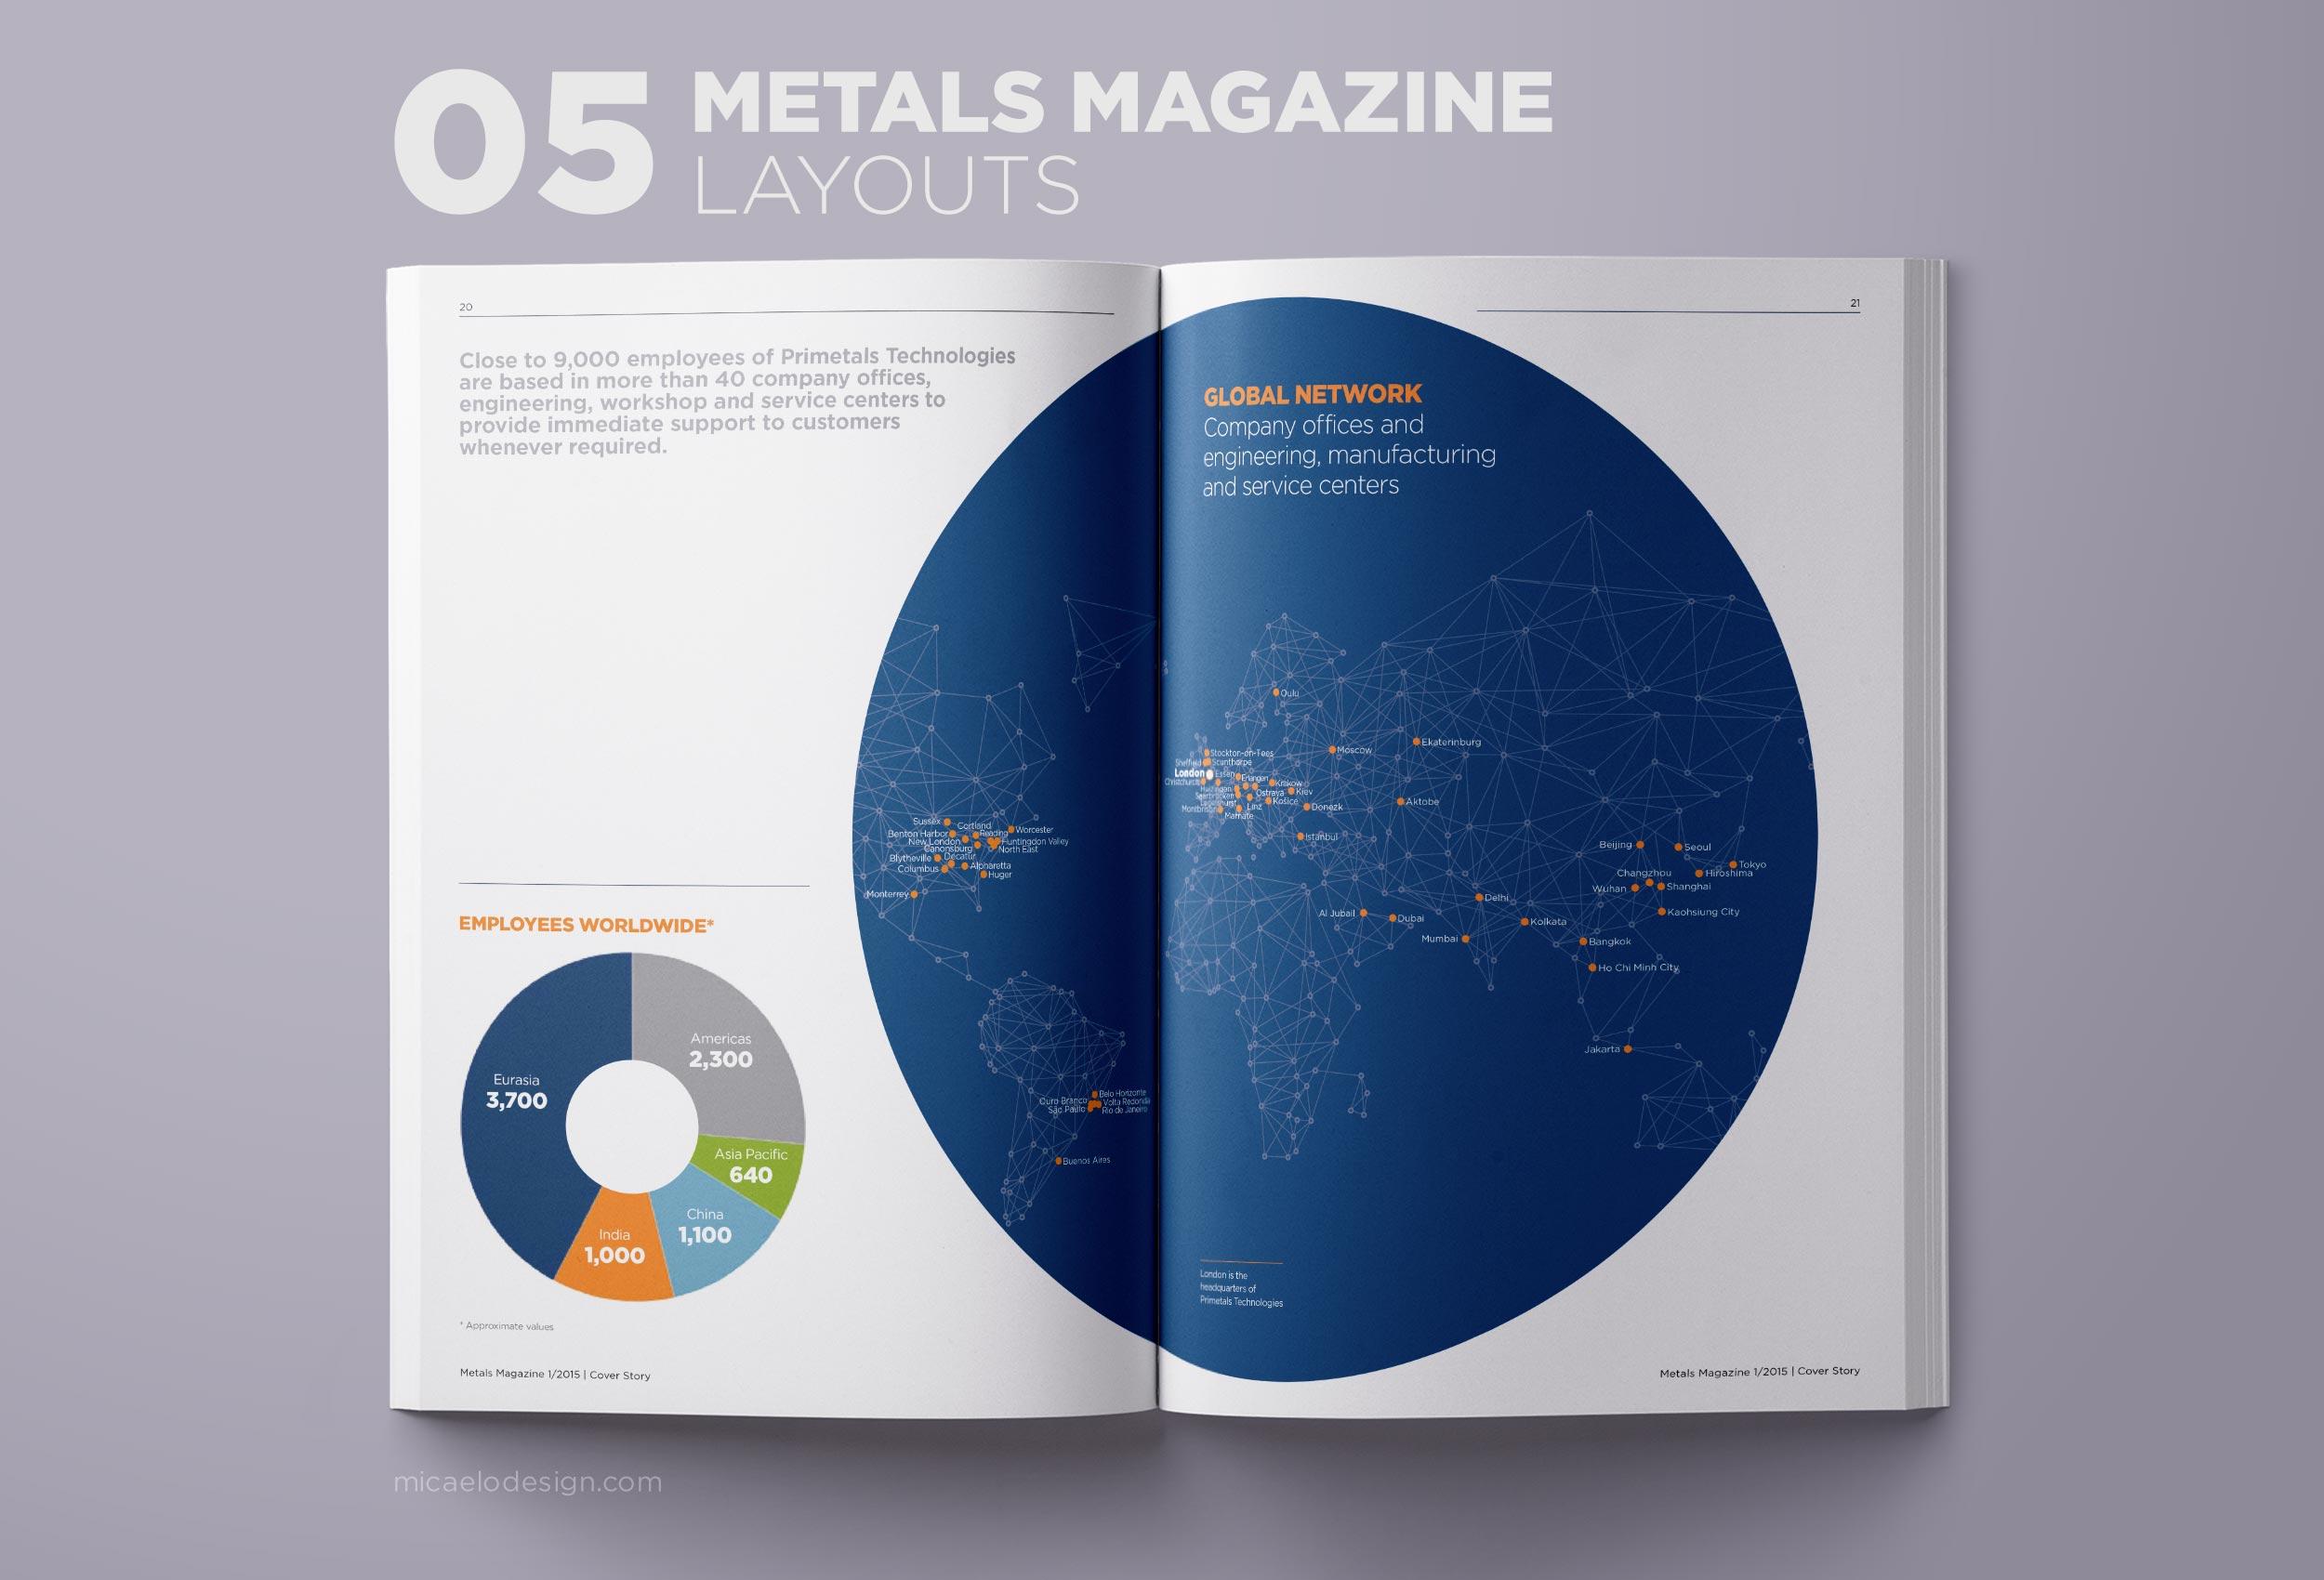 Primetals Metals Magazine layout N05